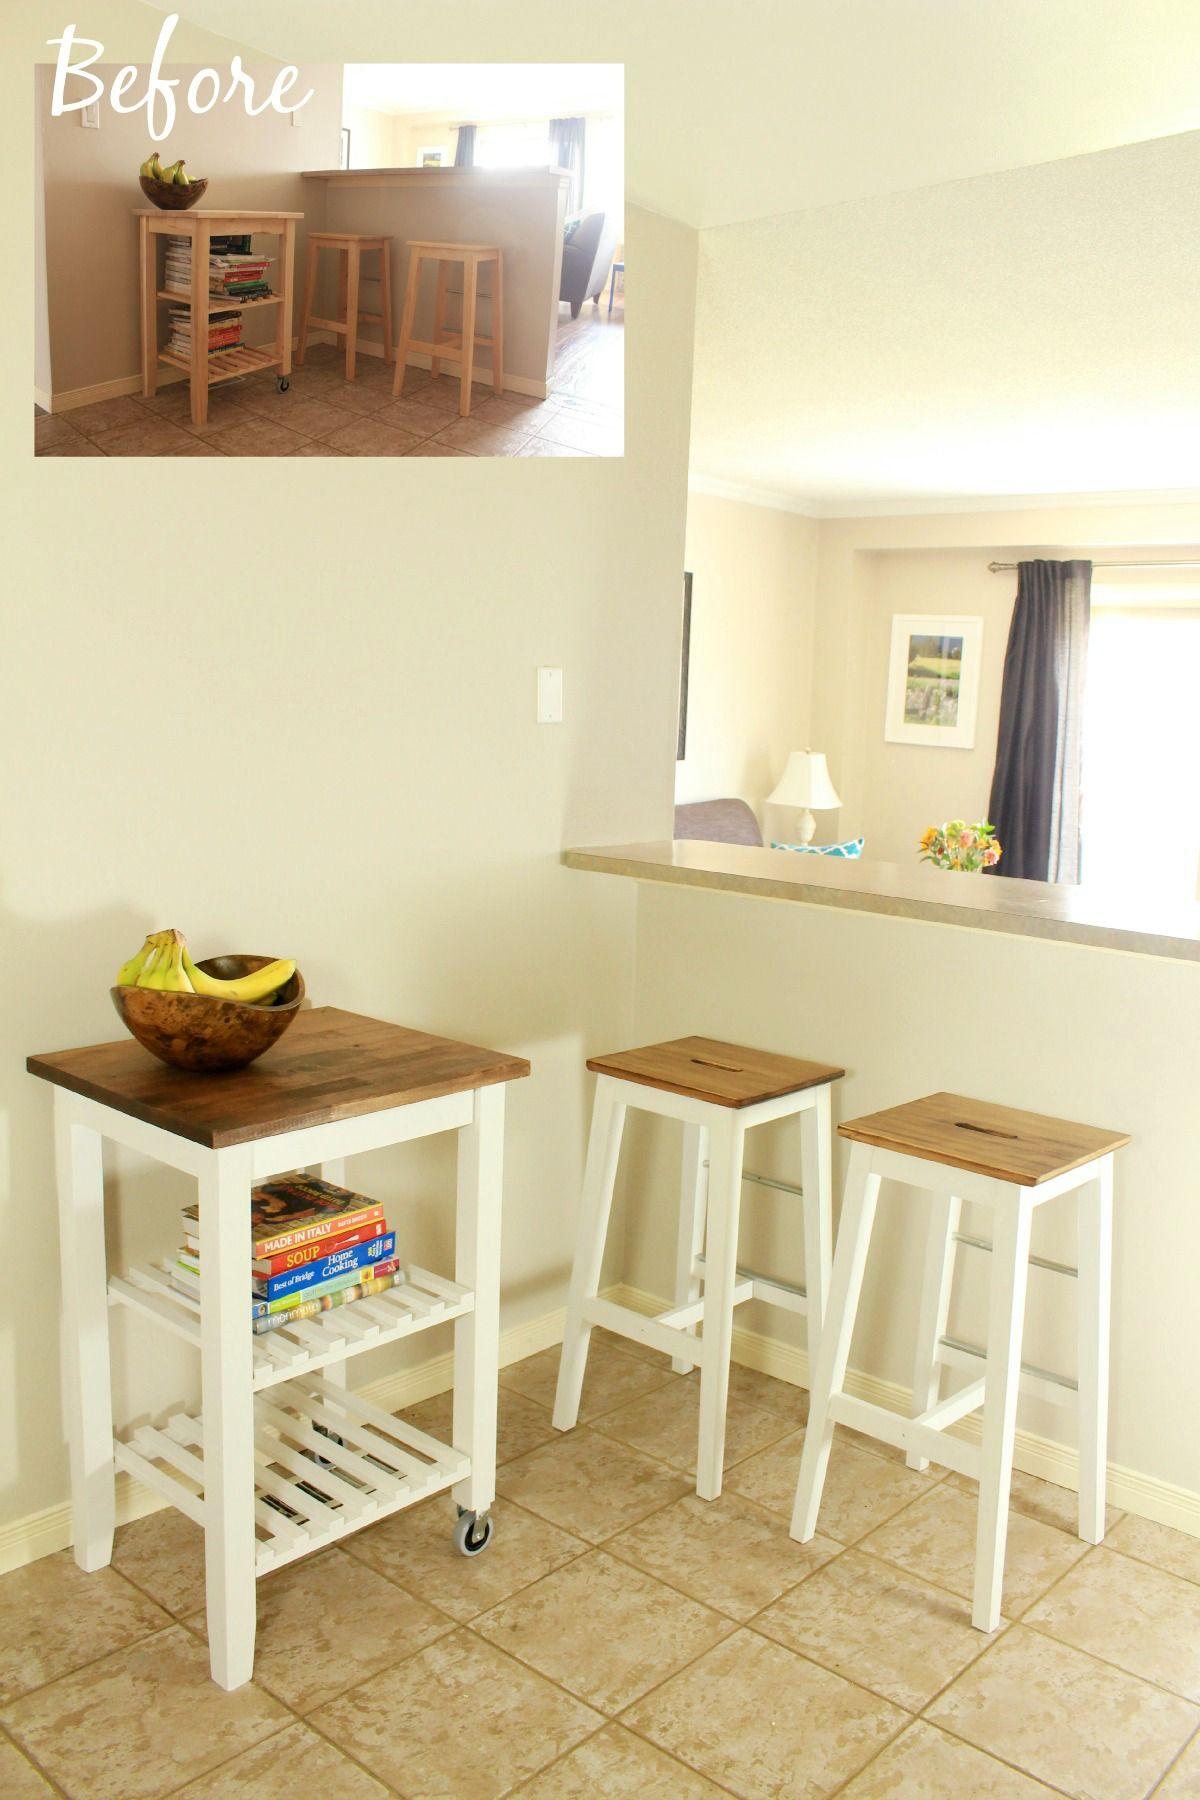 IKEA Hack: Kitchen Furniture Makeover | Ikea hack kitchen, Furniture ...